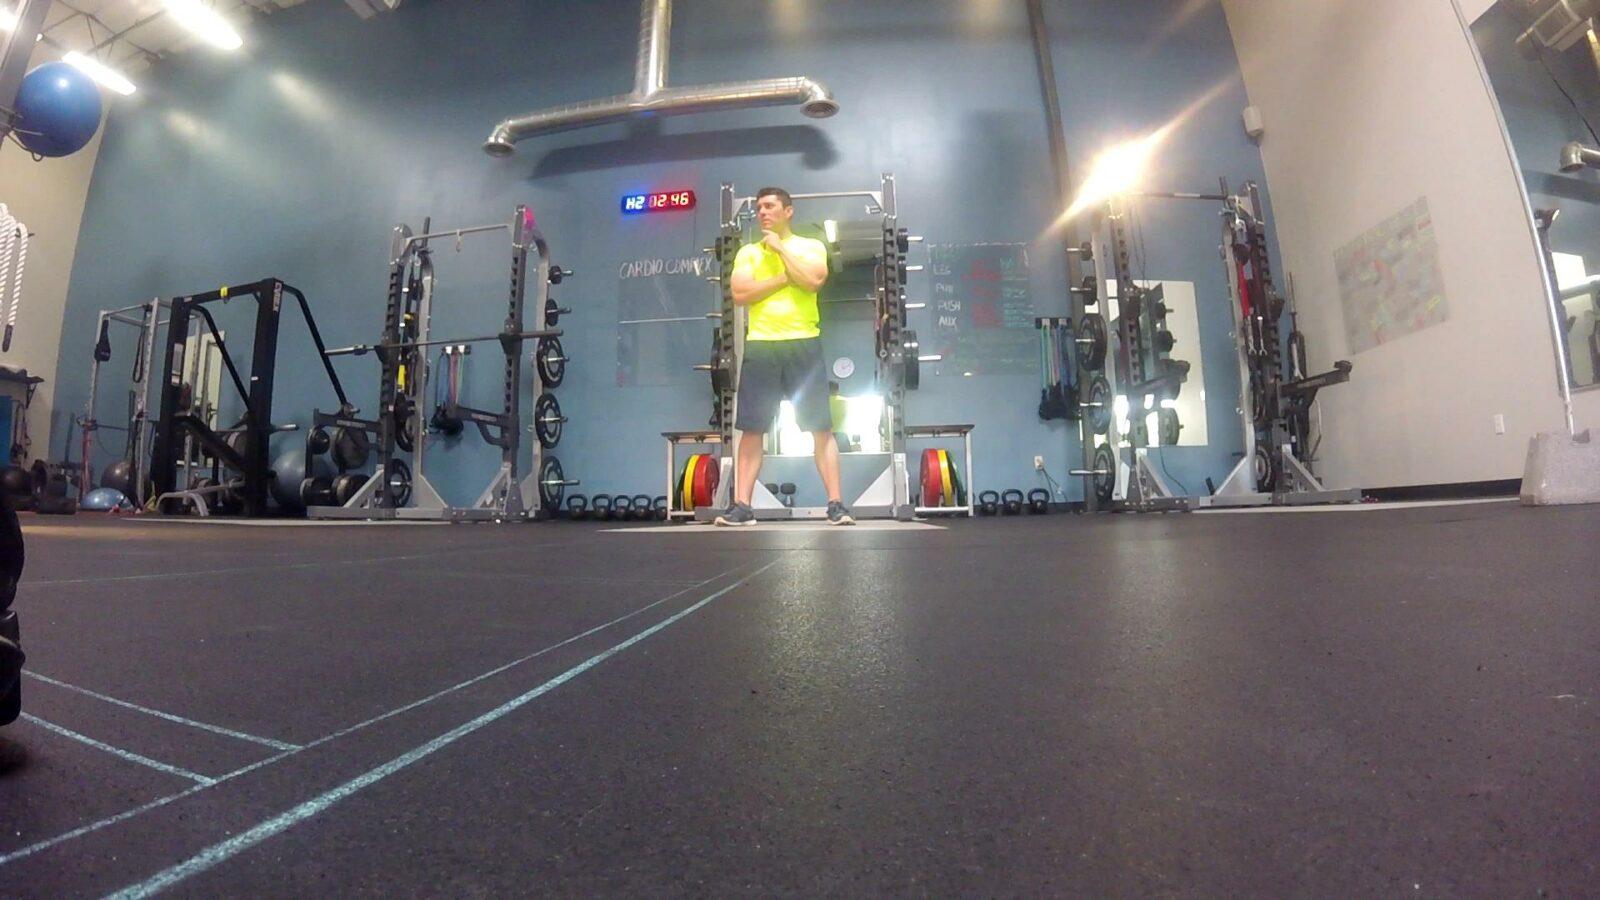 Gary at the gym